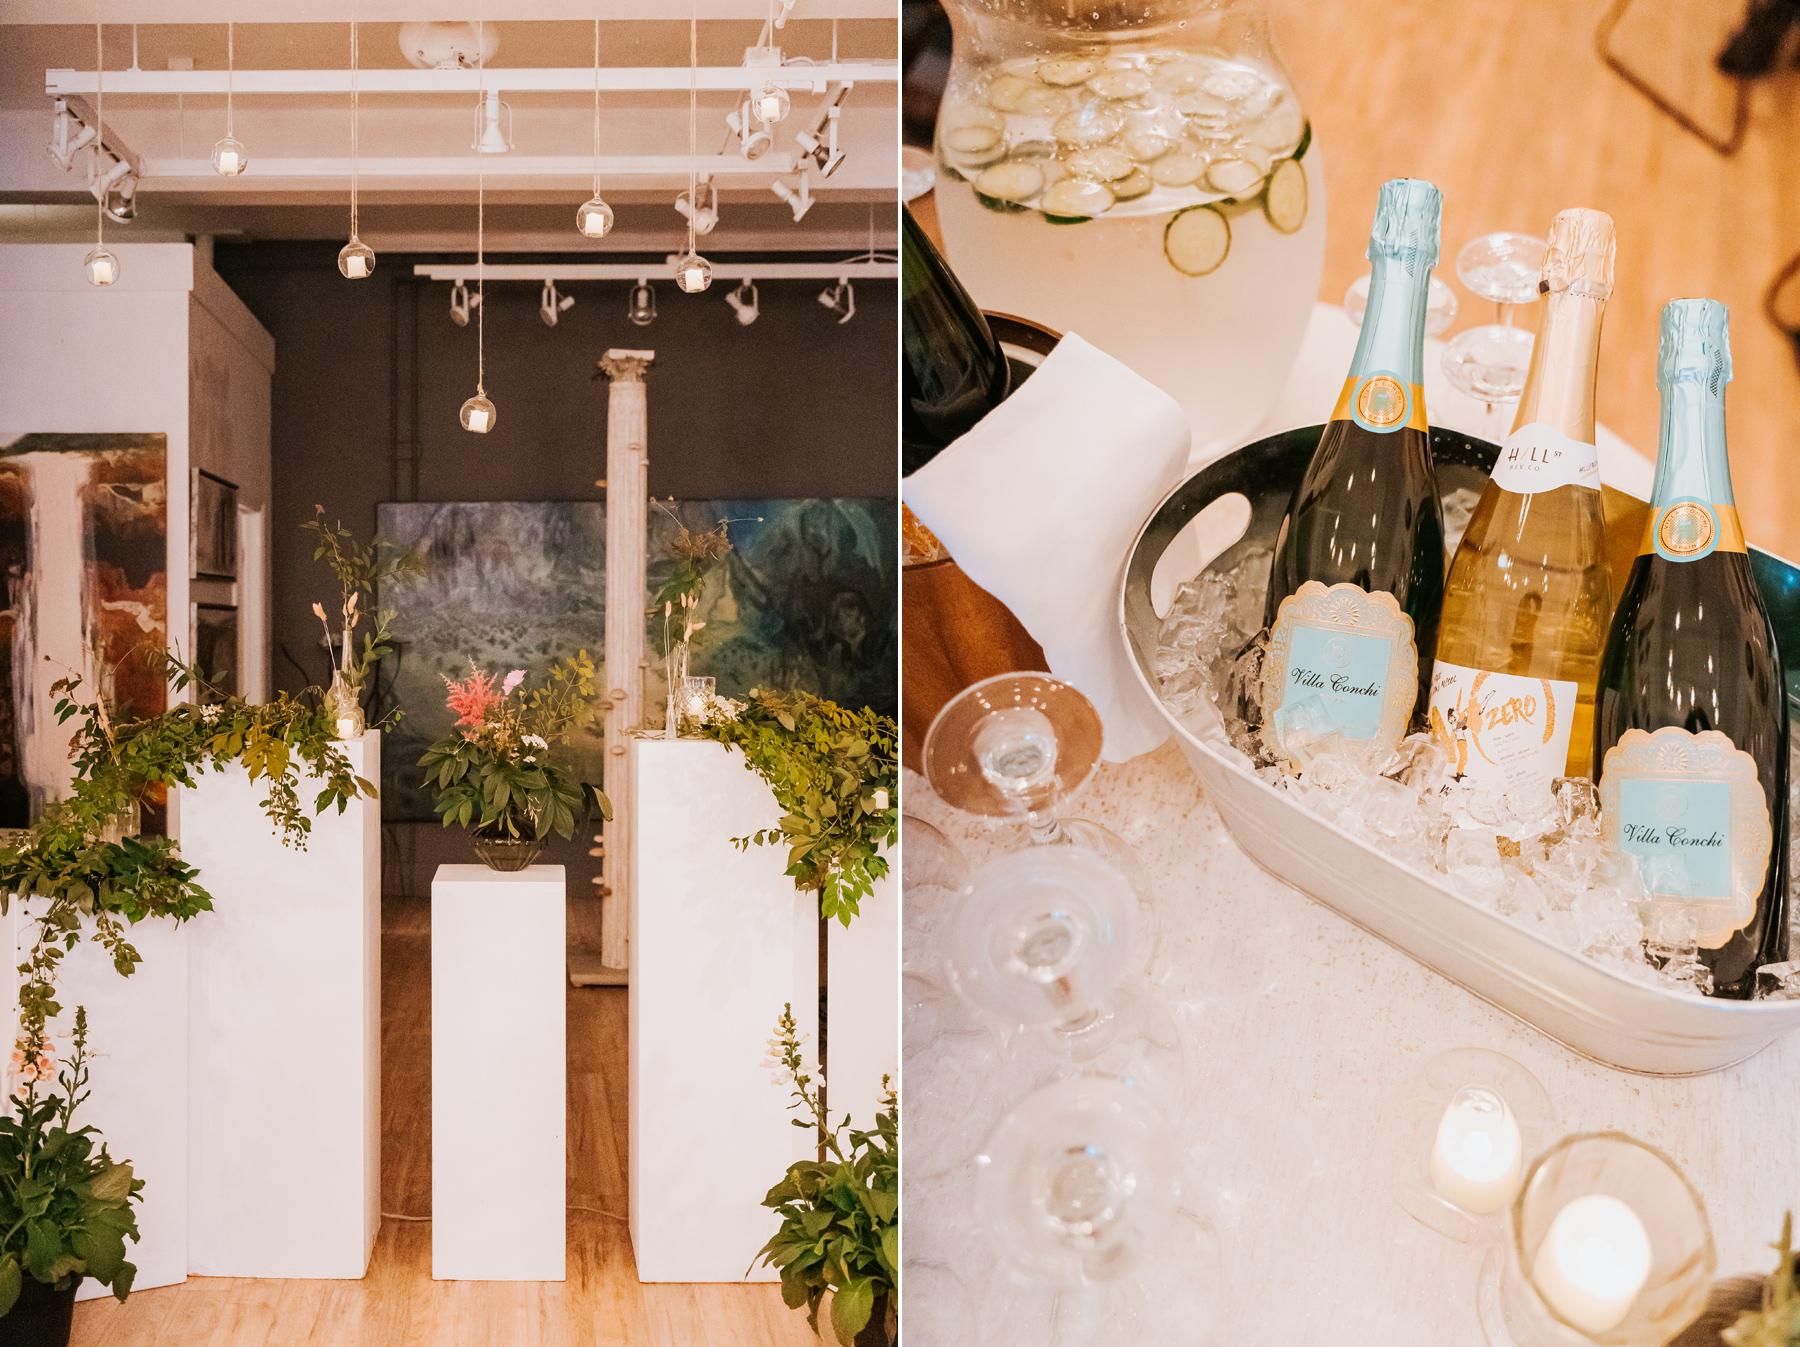 016-fredericton-wedding-kandise-brown-dm2020